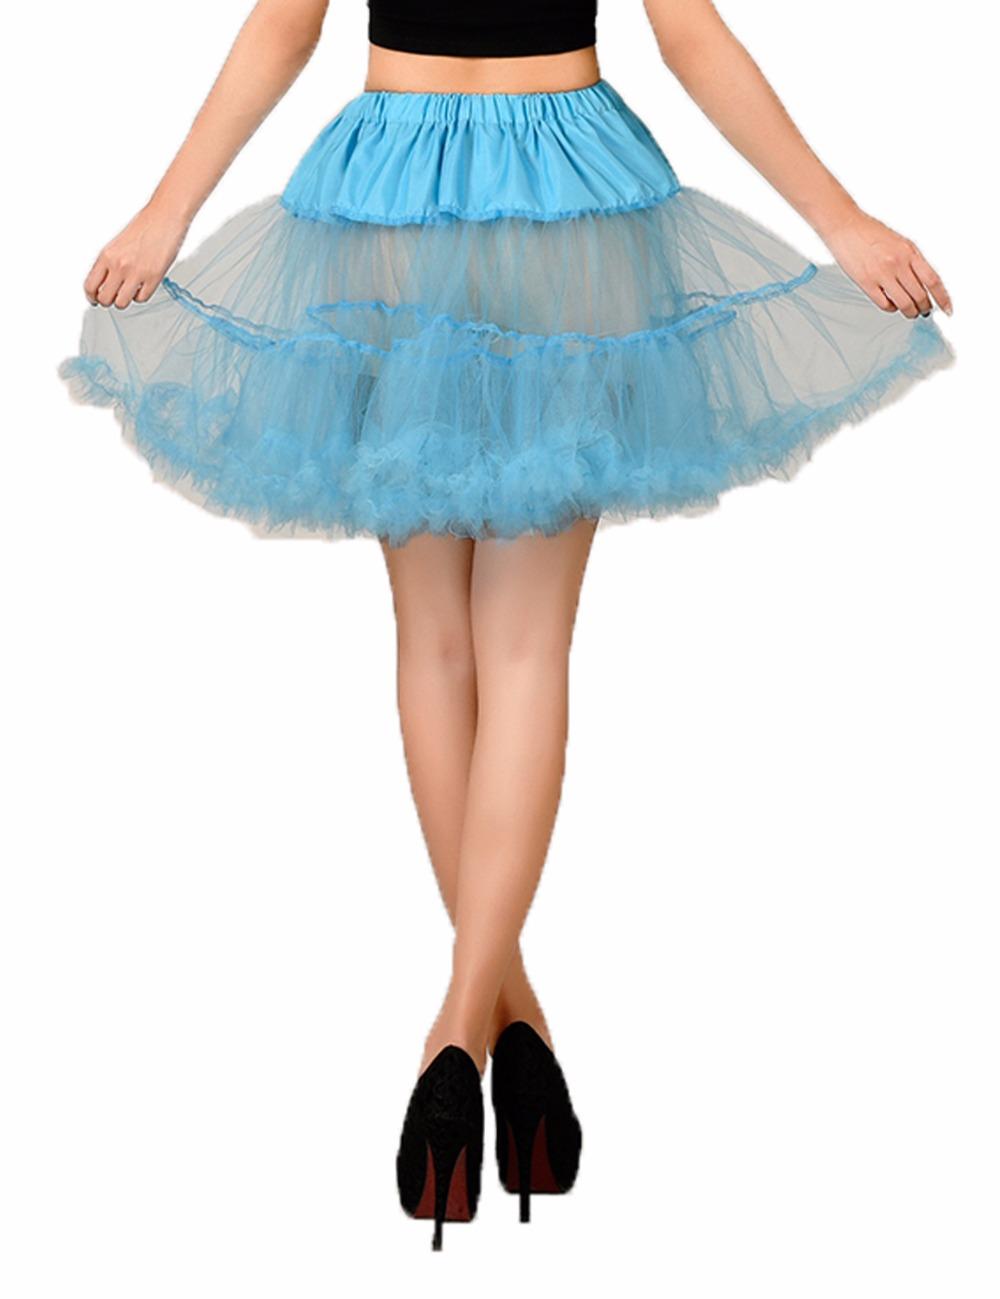 sexy free short halloween petticoat crinoline vintage wedding bridal petticoat for wedding dresses underskirt rockabilly tutu - Halloween Petticoat